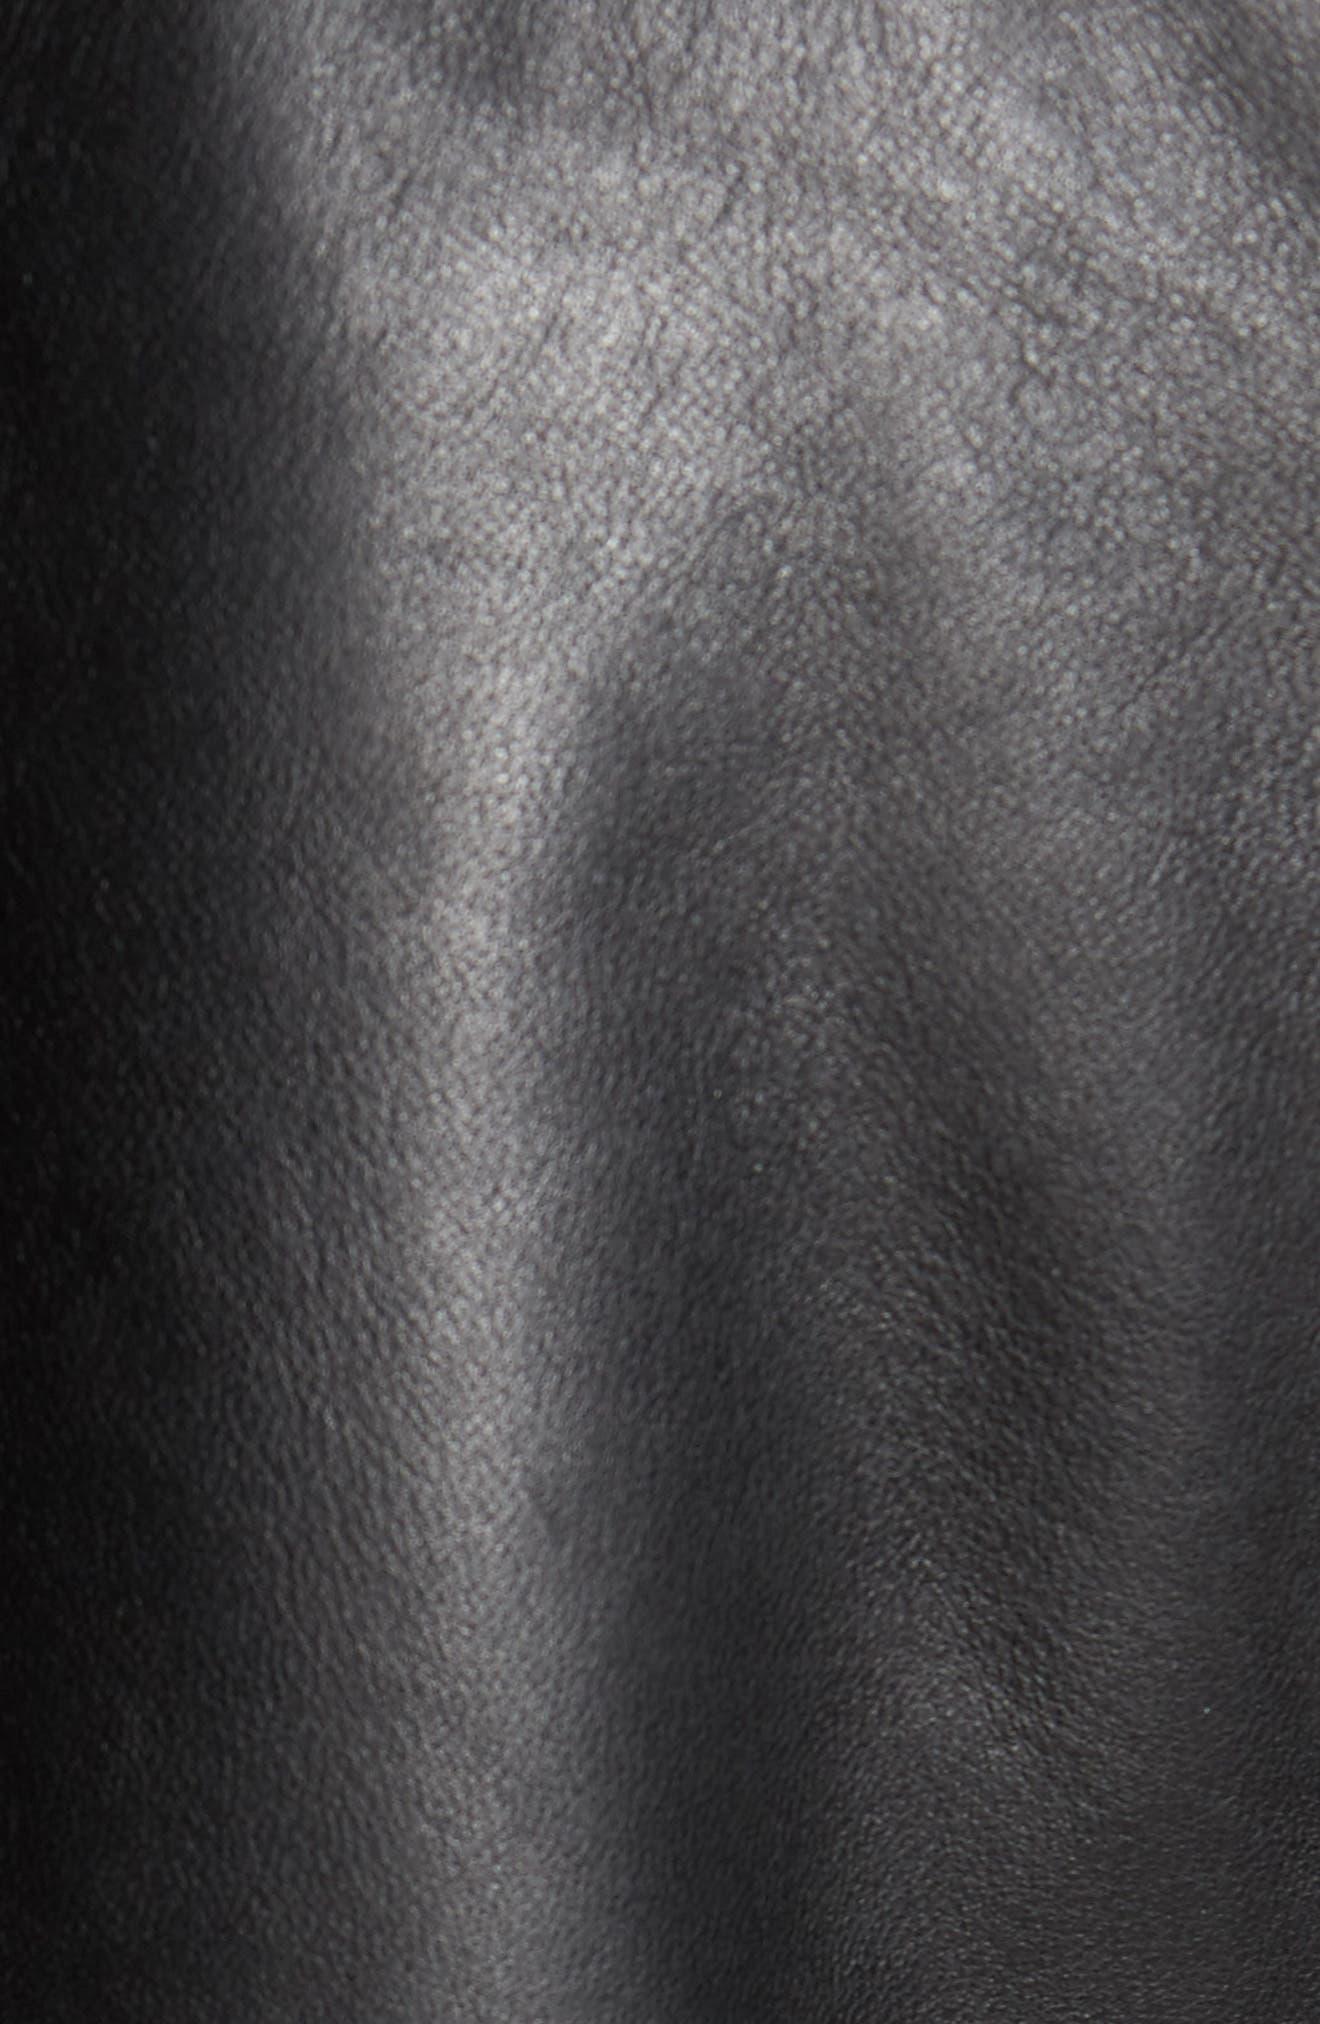 COLE HAAN, Lambskin Leather Moto Jacket, Alternate thumbnail 7, color, 001